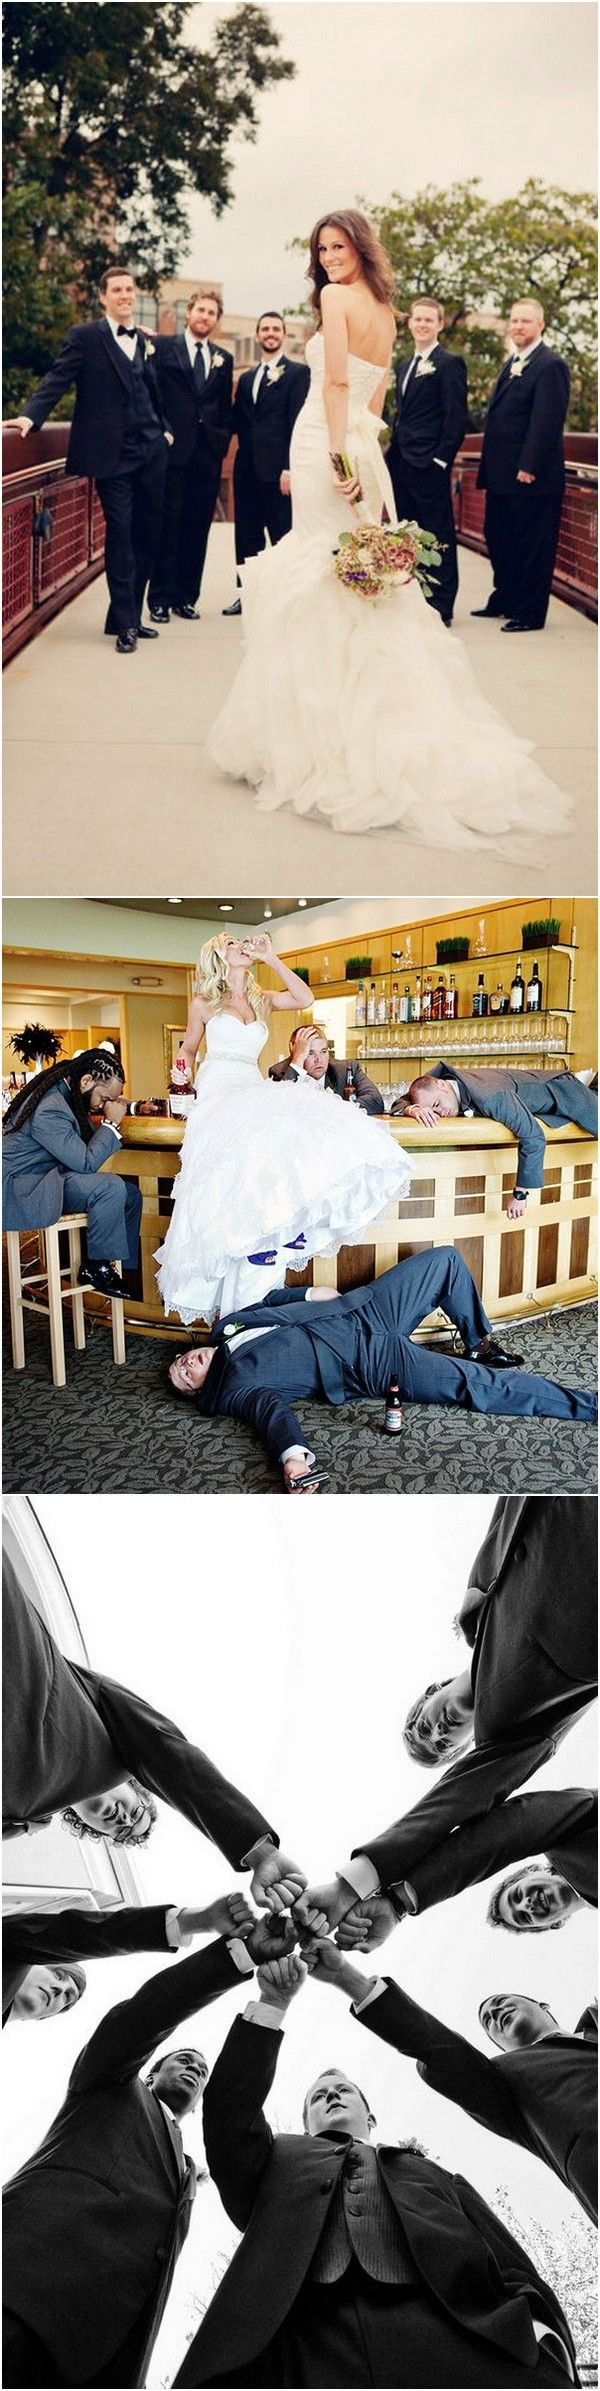 great bride with groomsmen wedding photo ideas